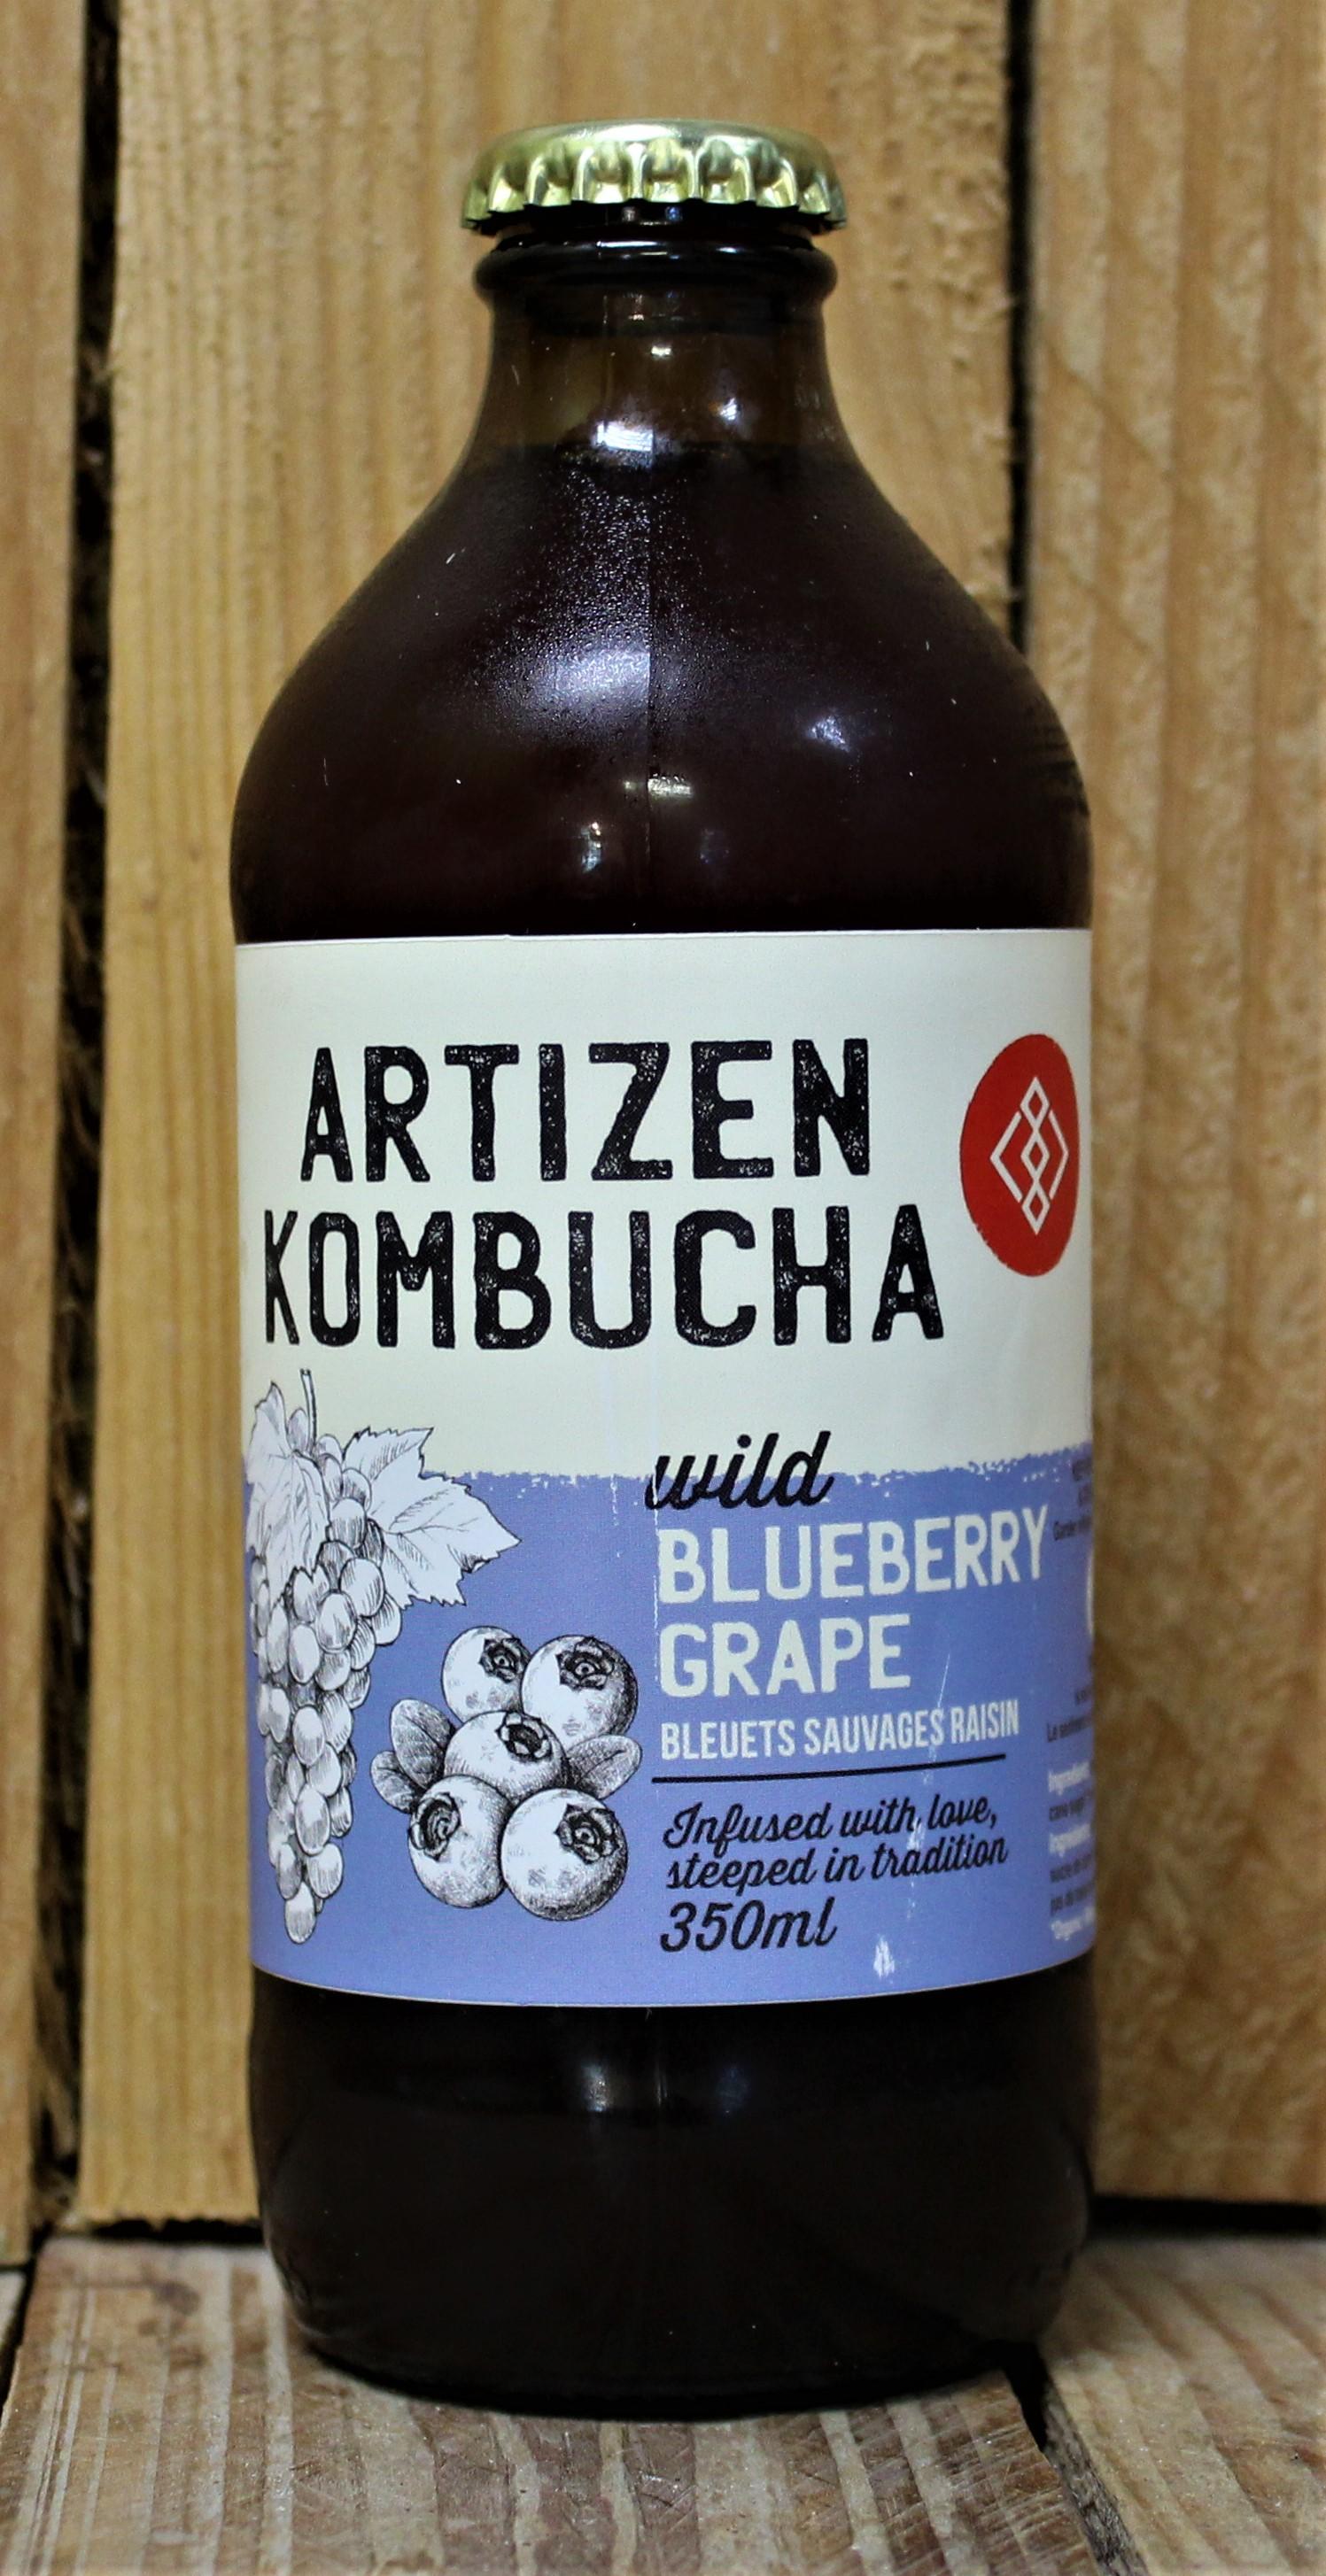 Artizen Kombucha – Wild Blueberry Grape (4 Bottles x 350ml)